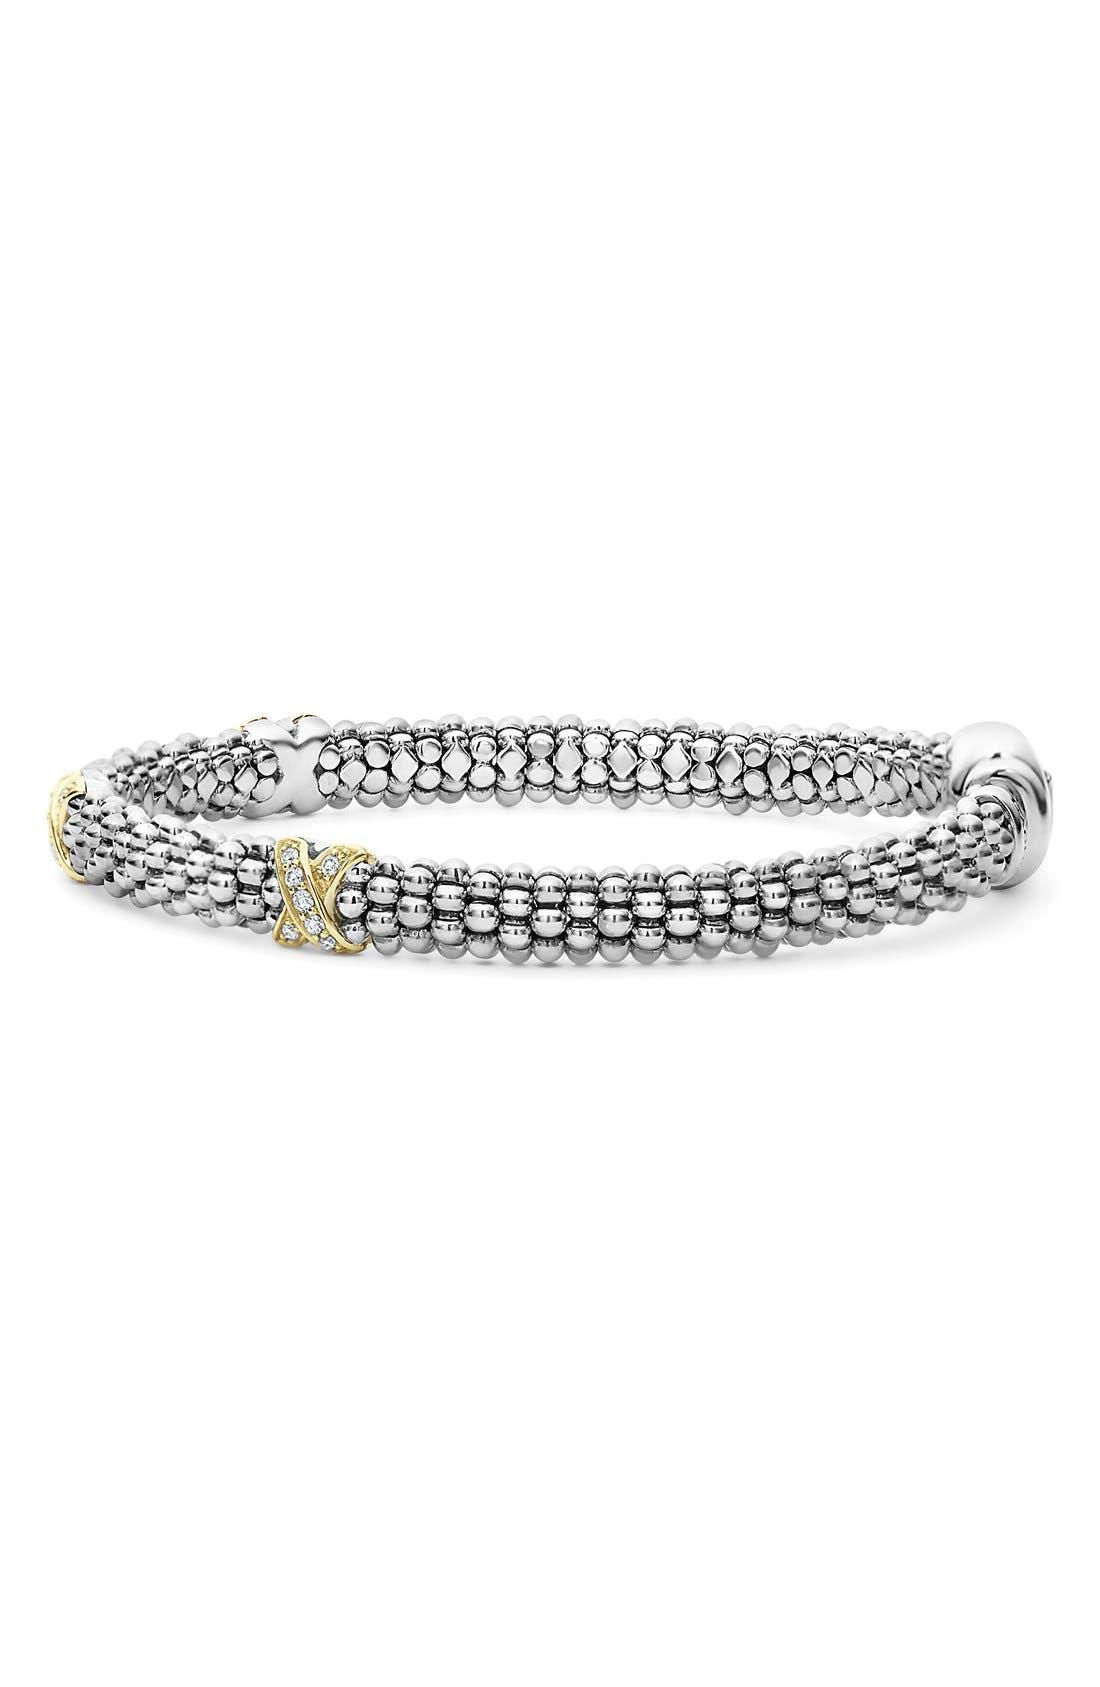 'Signature Caviar' Diamond Rope Bracelet,                             Alternate thumbnail 3, color,                             SILVER/ GOLD